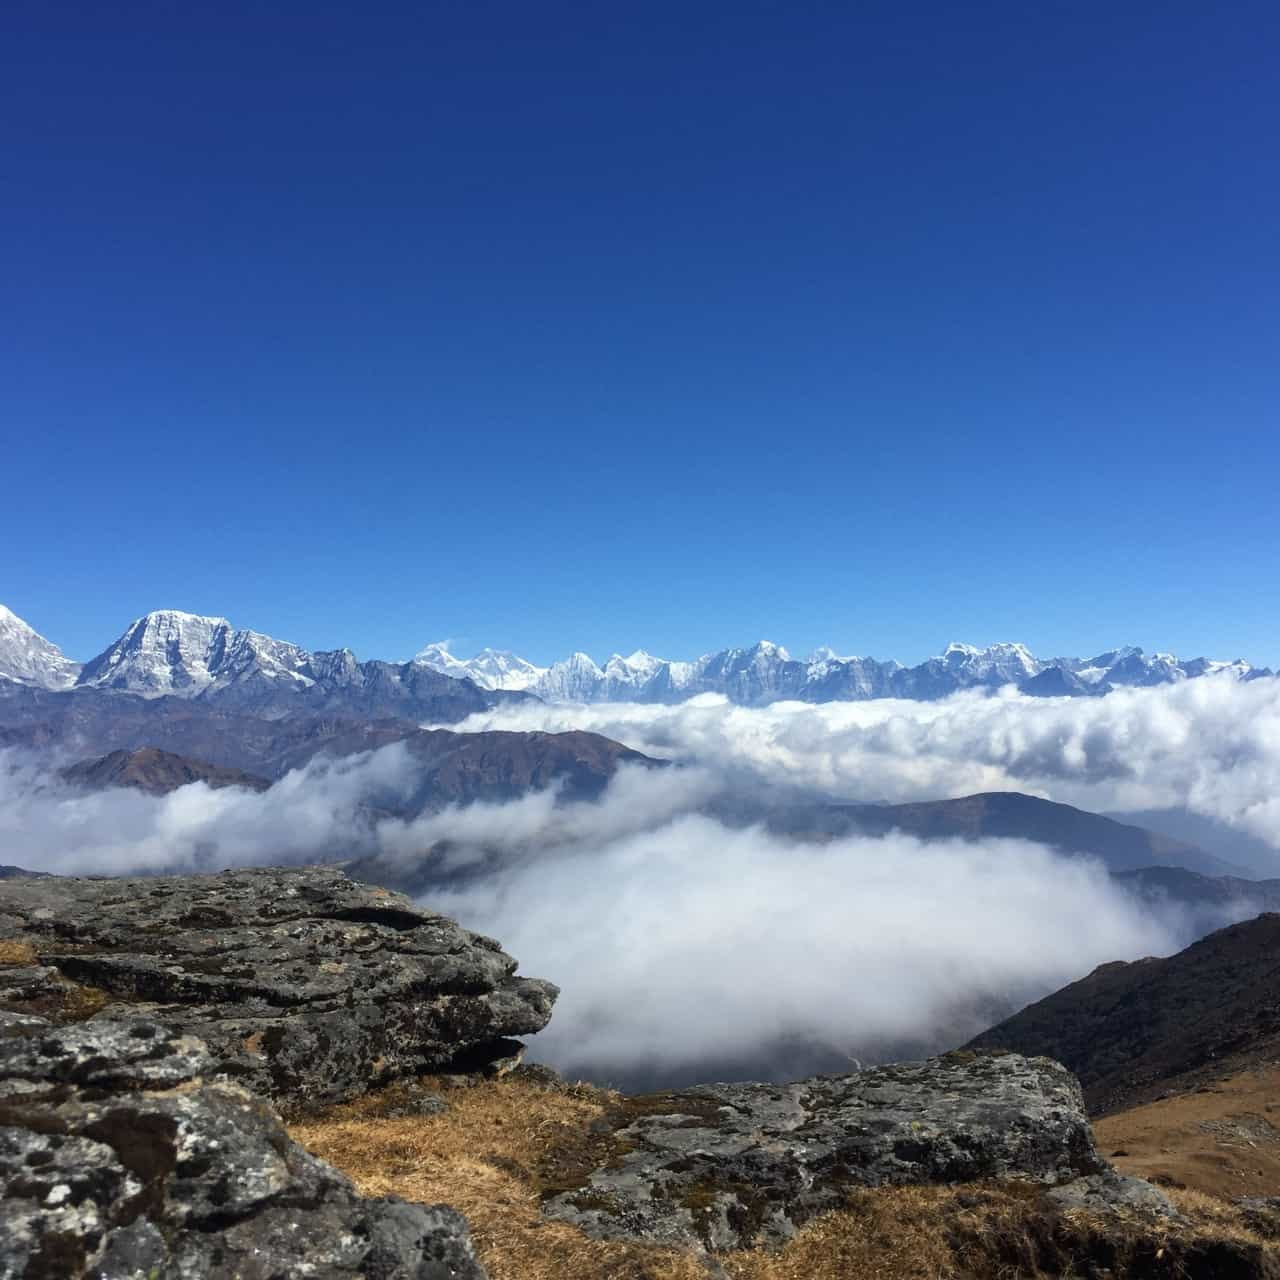 himalayan journey, panorama view from pikey peak